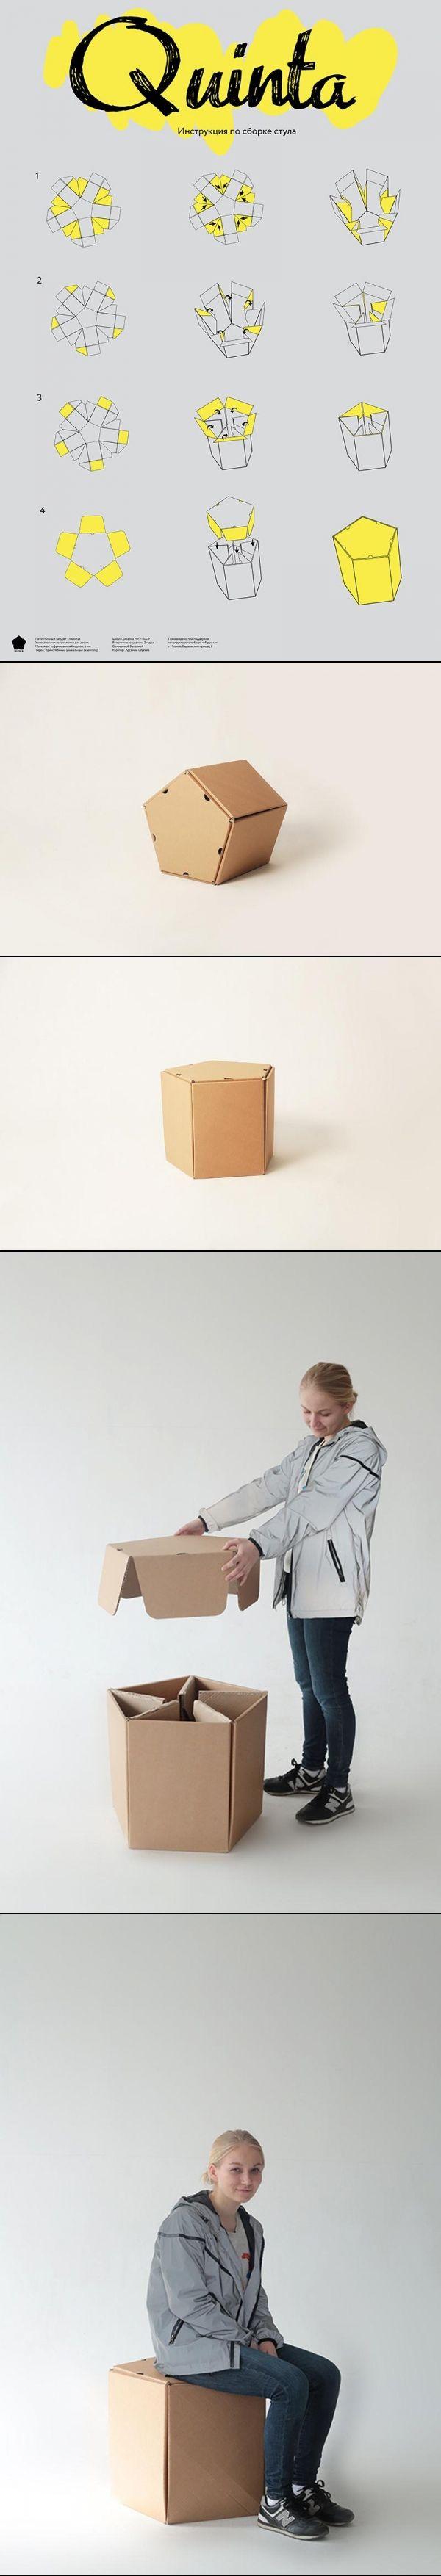 Cardboard chair Quinta by Valeriya Solovyeva Curator